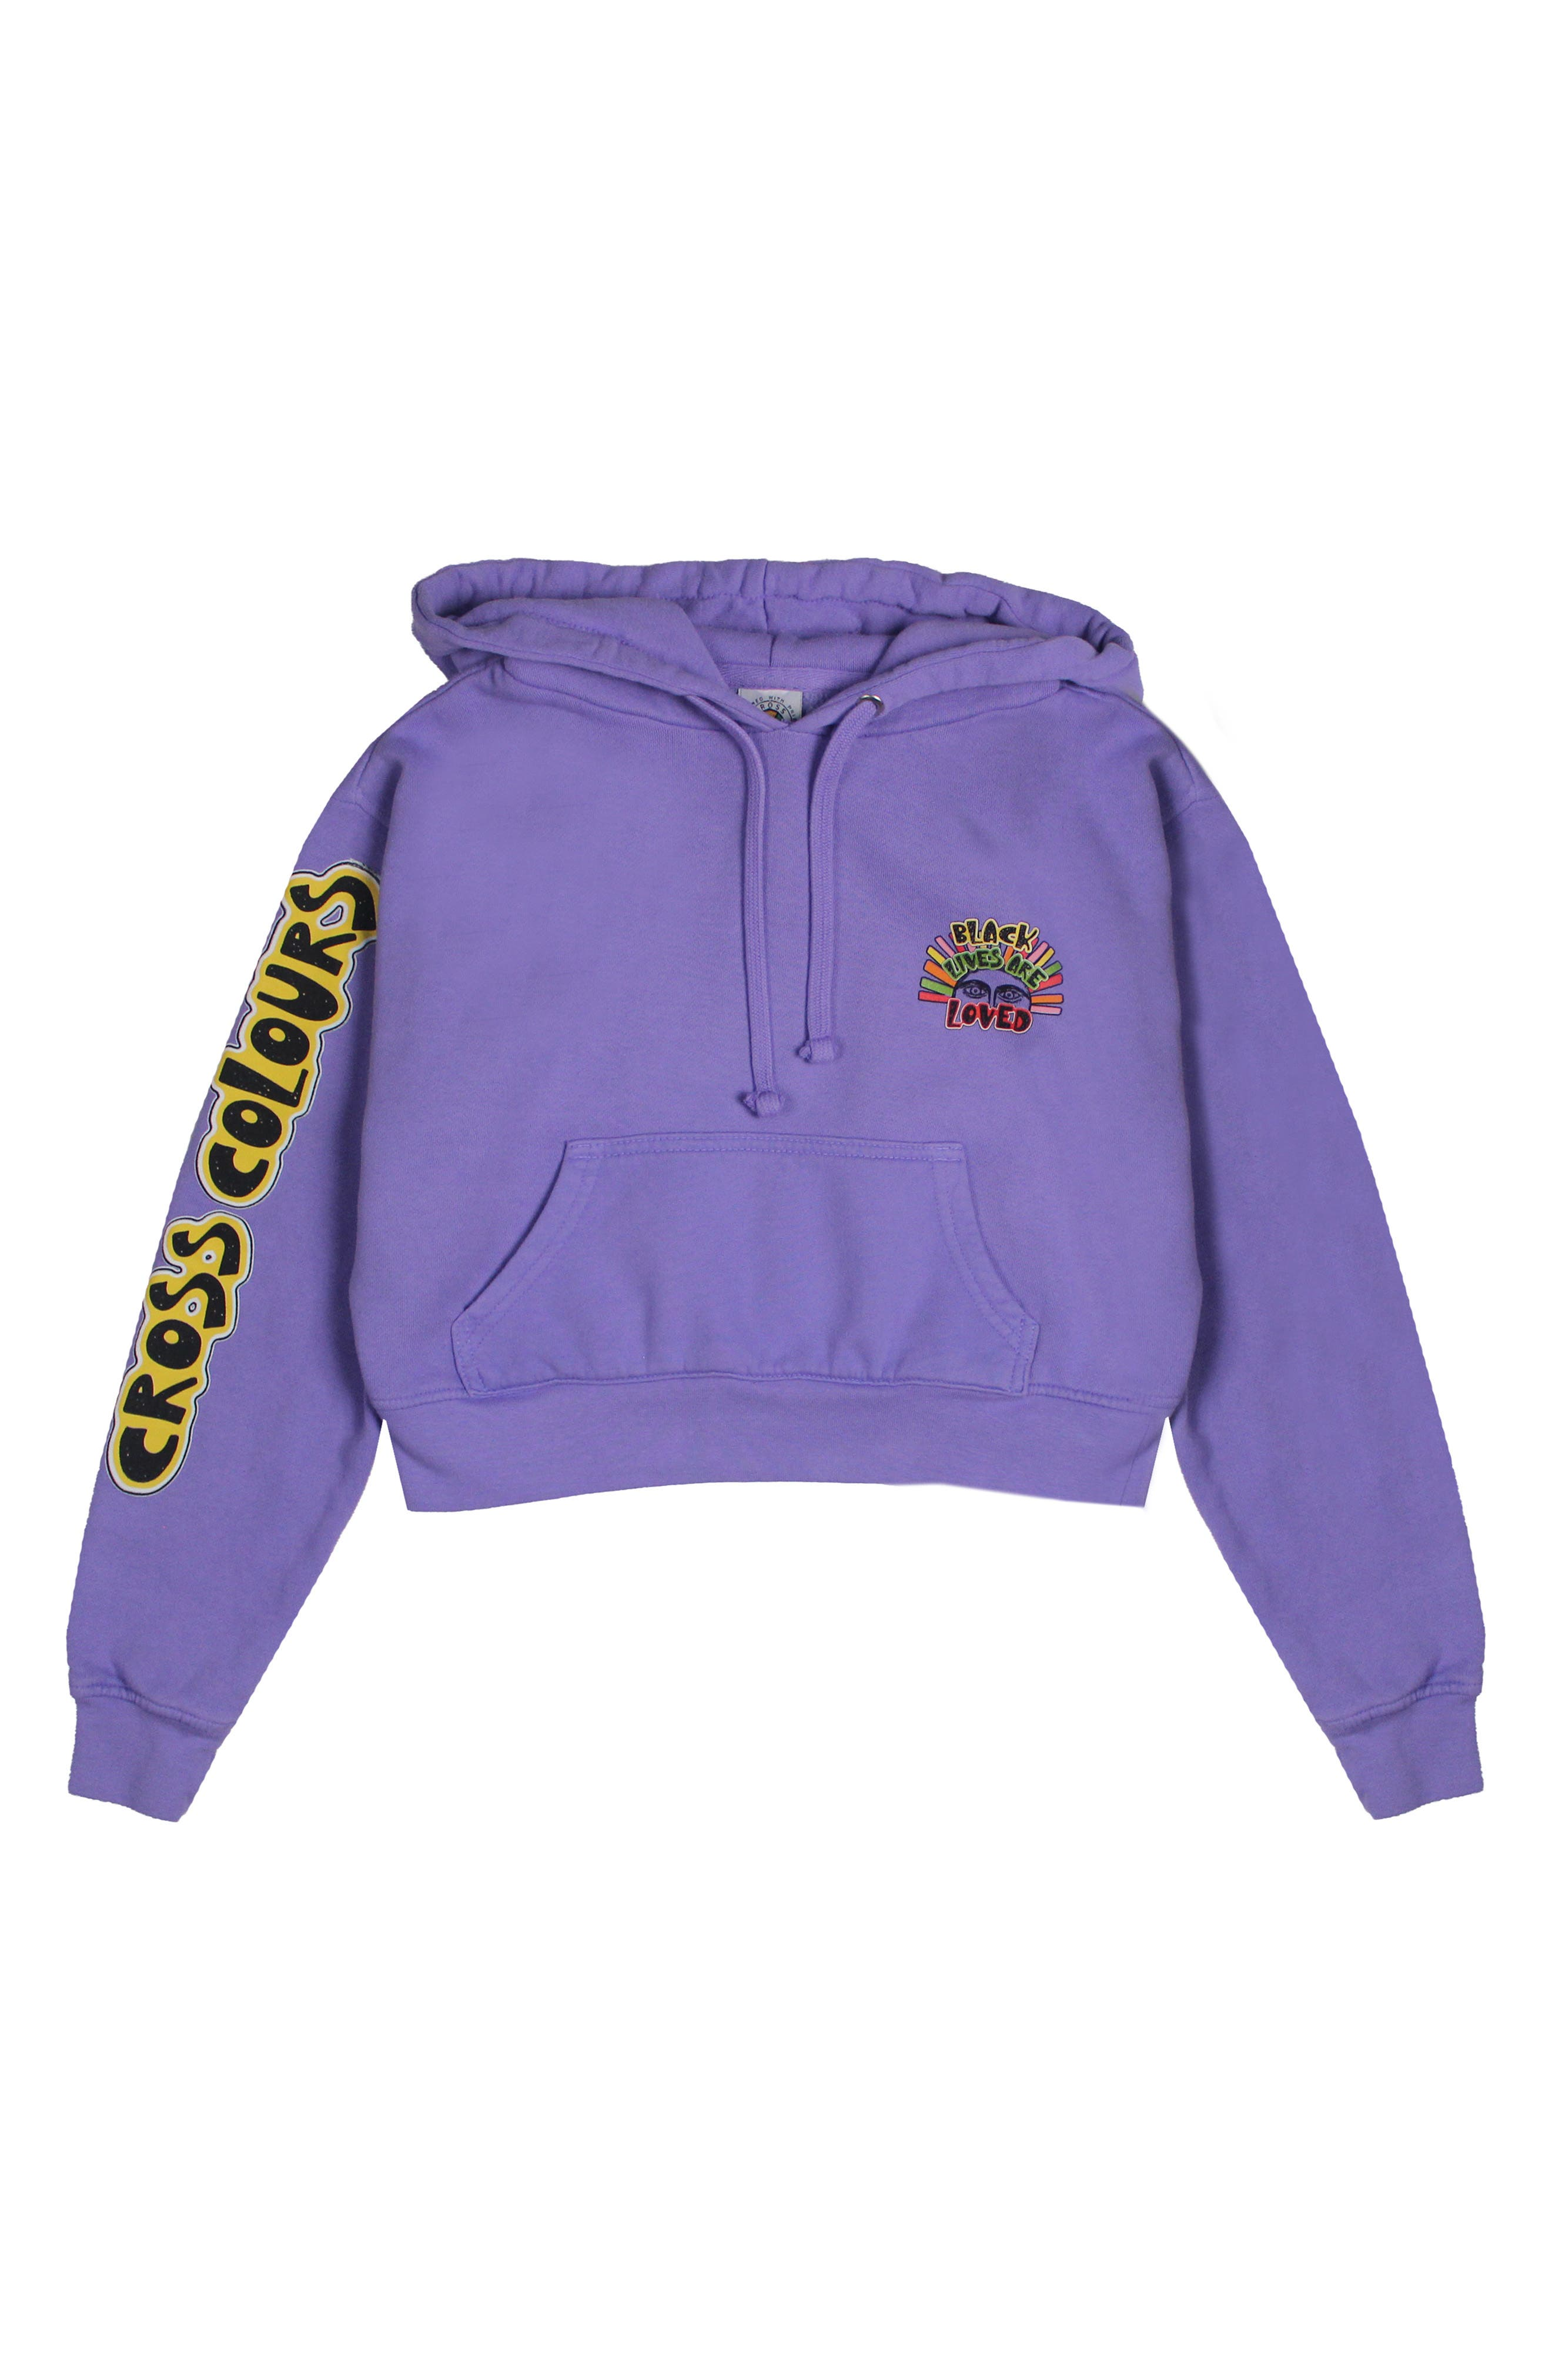 Black Lives Are Loved Crop Sweatshirt